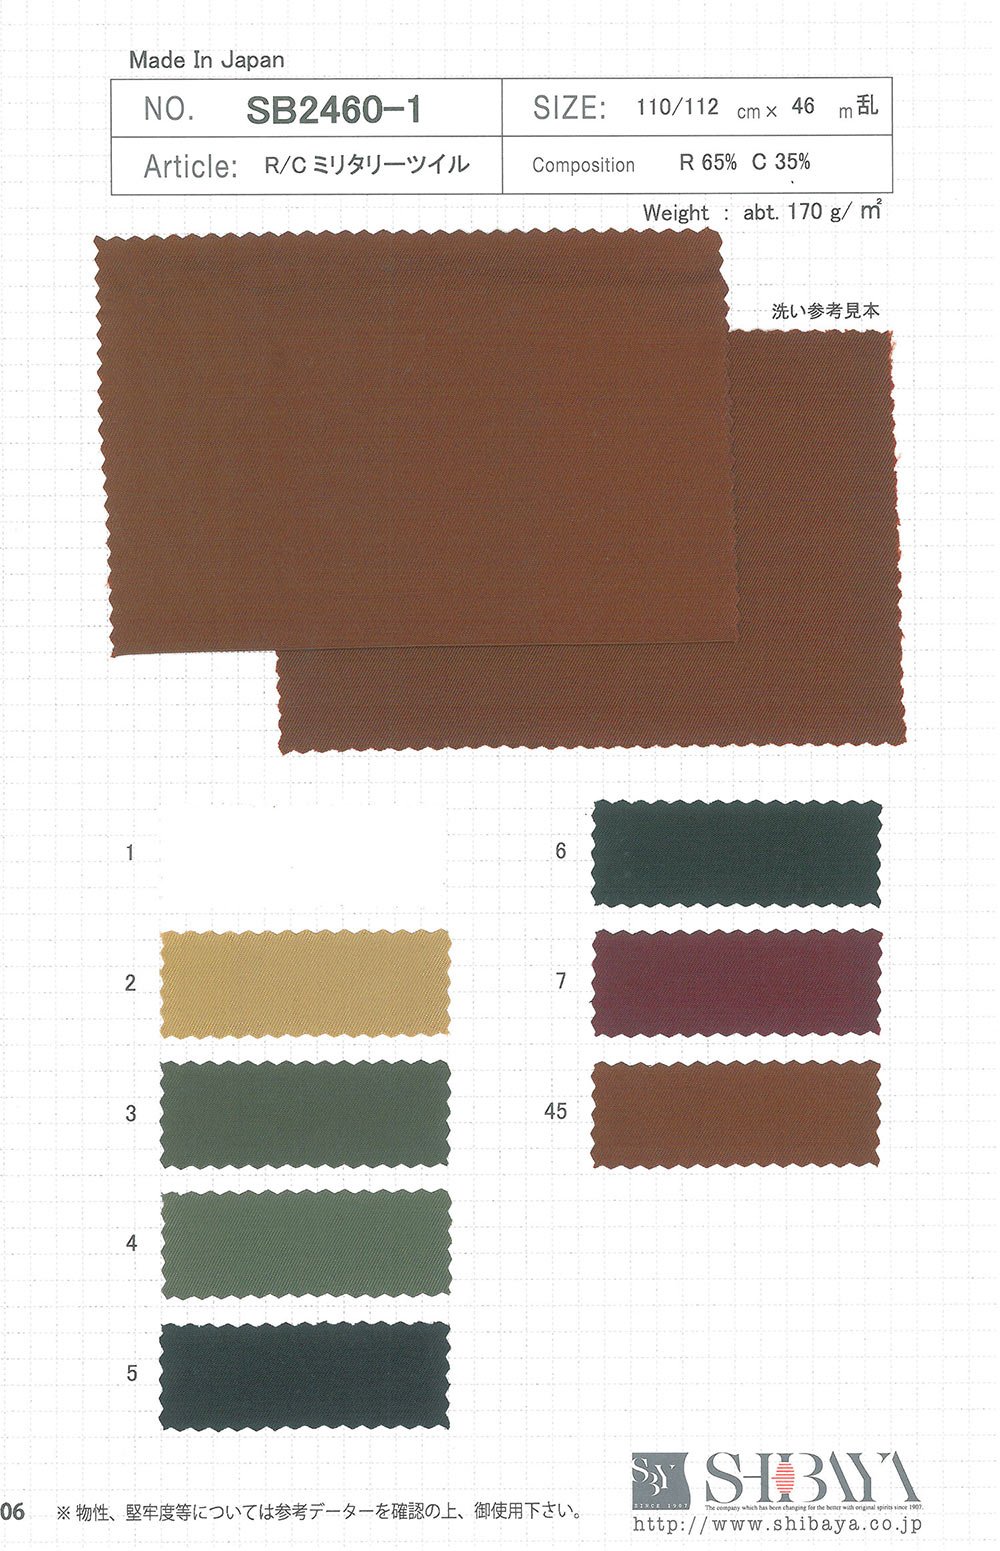 SB2460-1 R/Cミリタリーツイル[生地] 柴屋/オークラ商事 - ApparelX アパレル資材卸通販